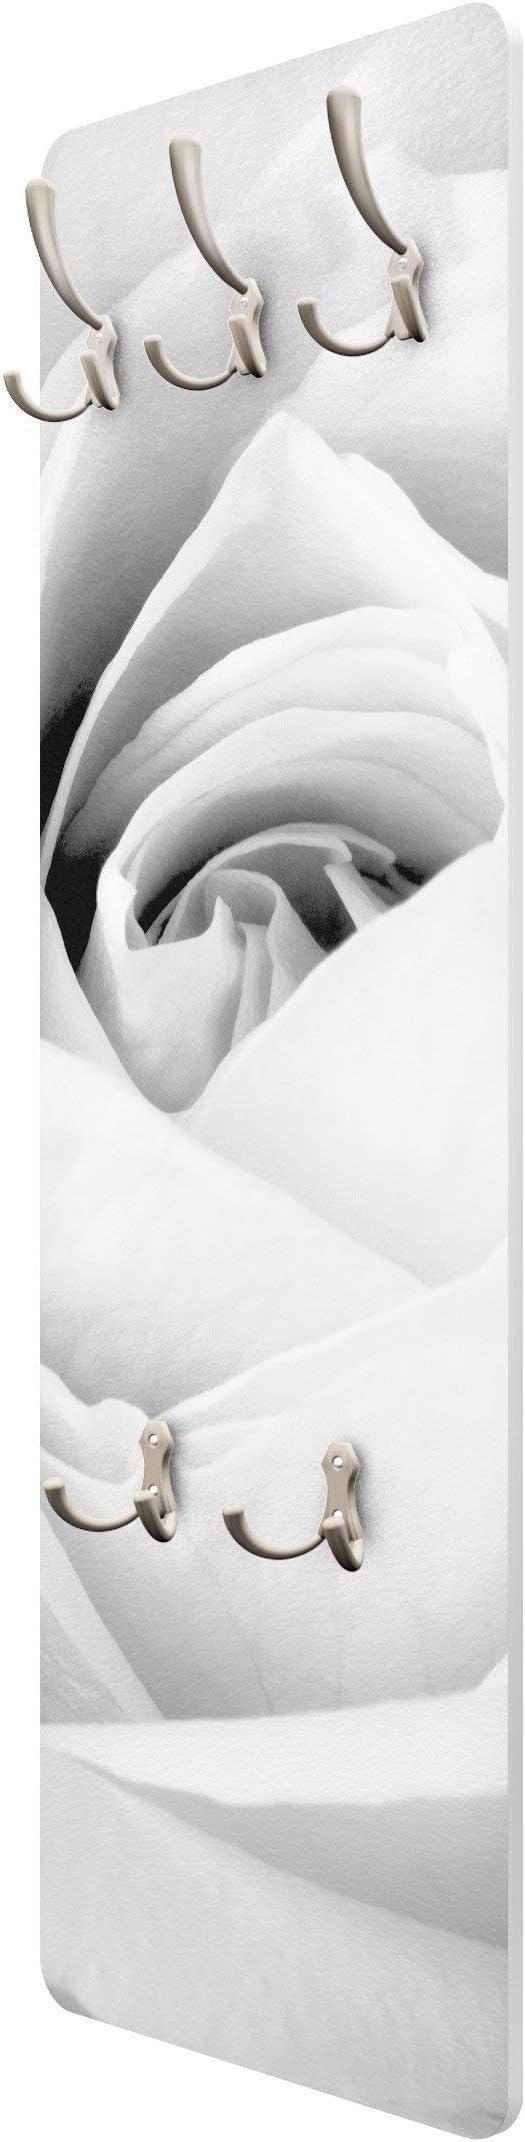 Appendiabiti da Parete Appendiabiti /Pretty White Rose 139/x 46/x 2/cm,/ Appendiabiti Apalis Appendiabiti/ Appendiabiti da Parete /Appendiabiti attaccapanni Dimensioni Hxw: 139/cm x 46/cm